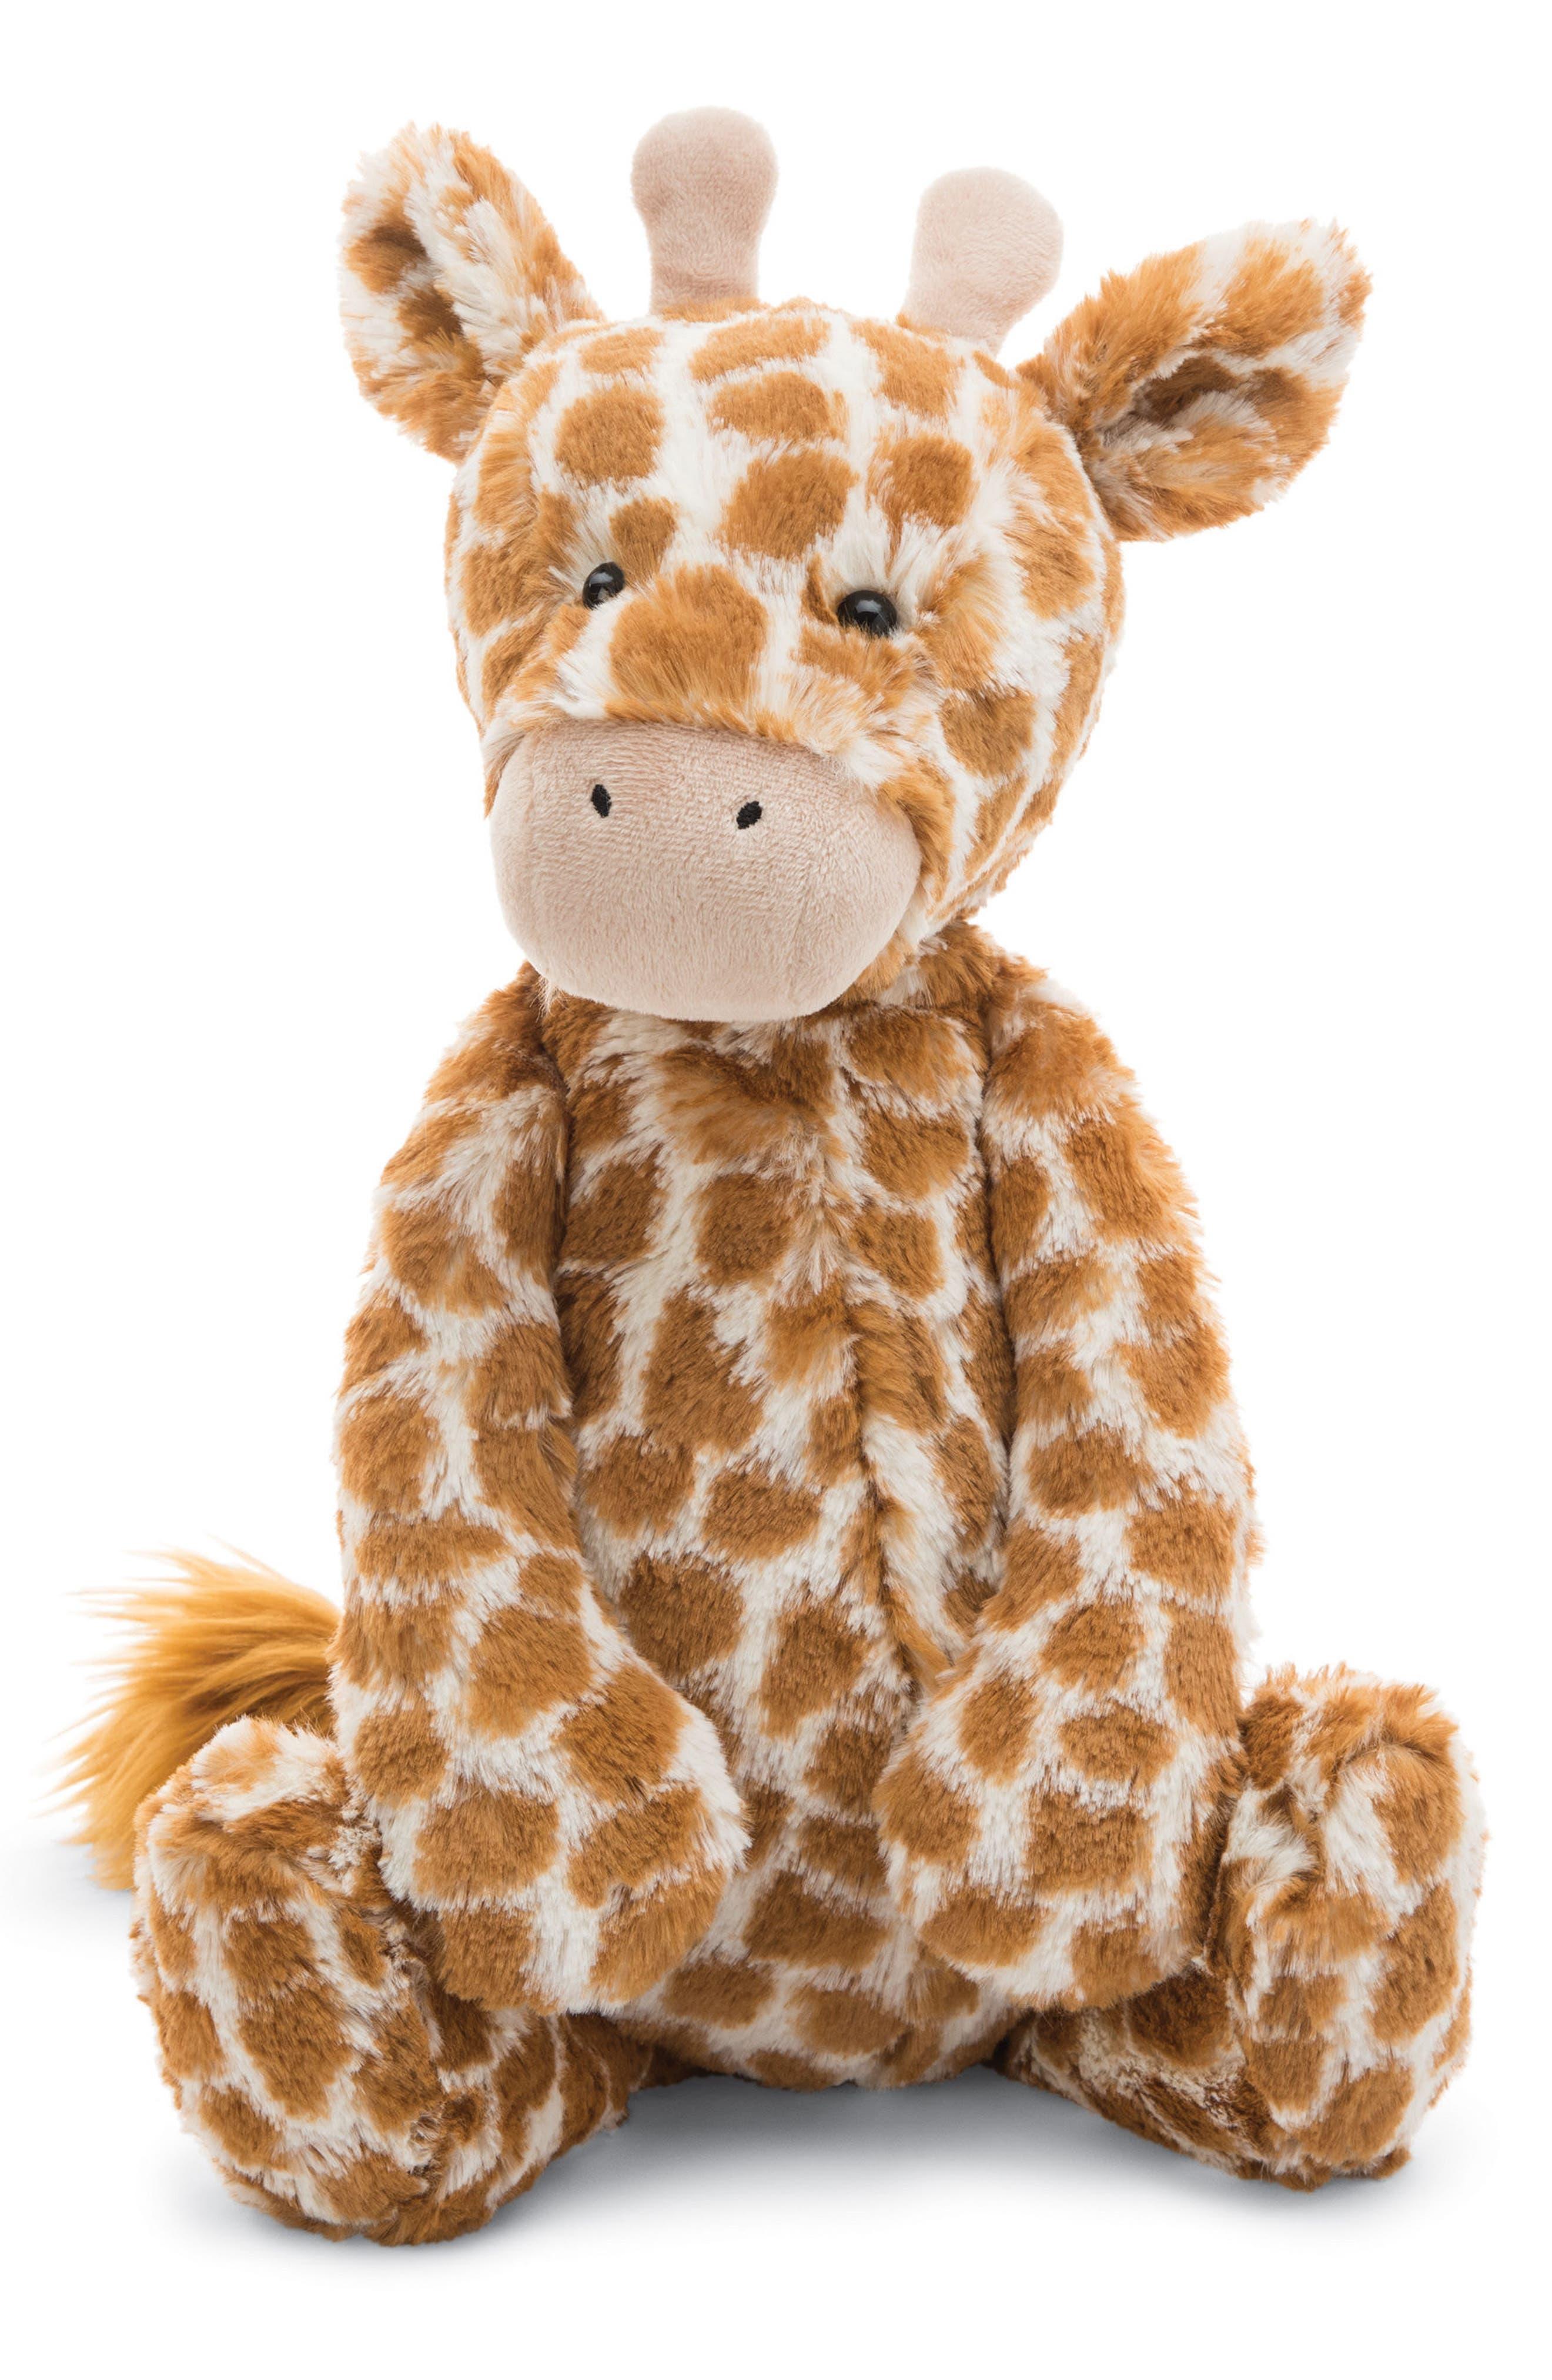 Large Bashful Giraffe Stuffed Animal,                             Main thumbnail 1, color,                             Brown / Cream